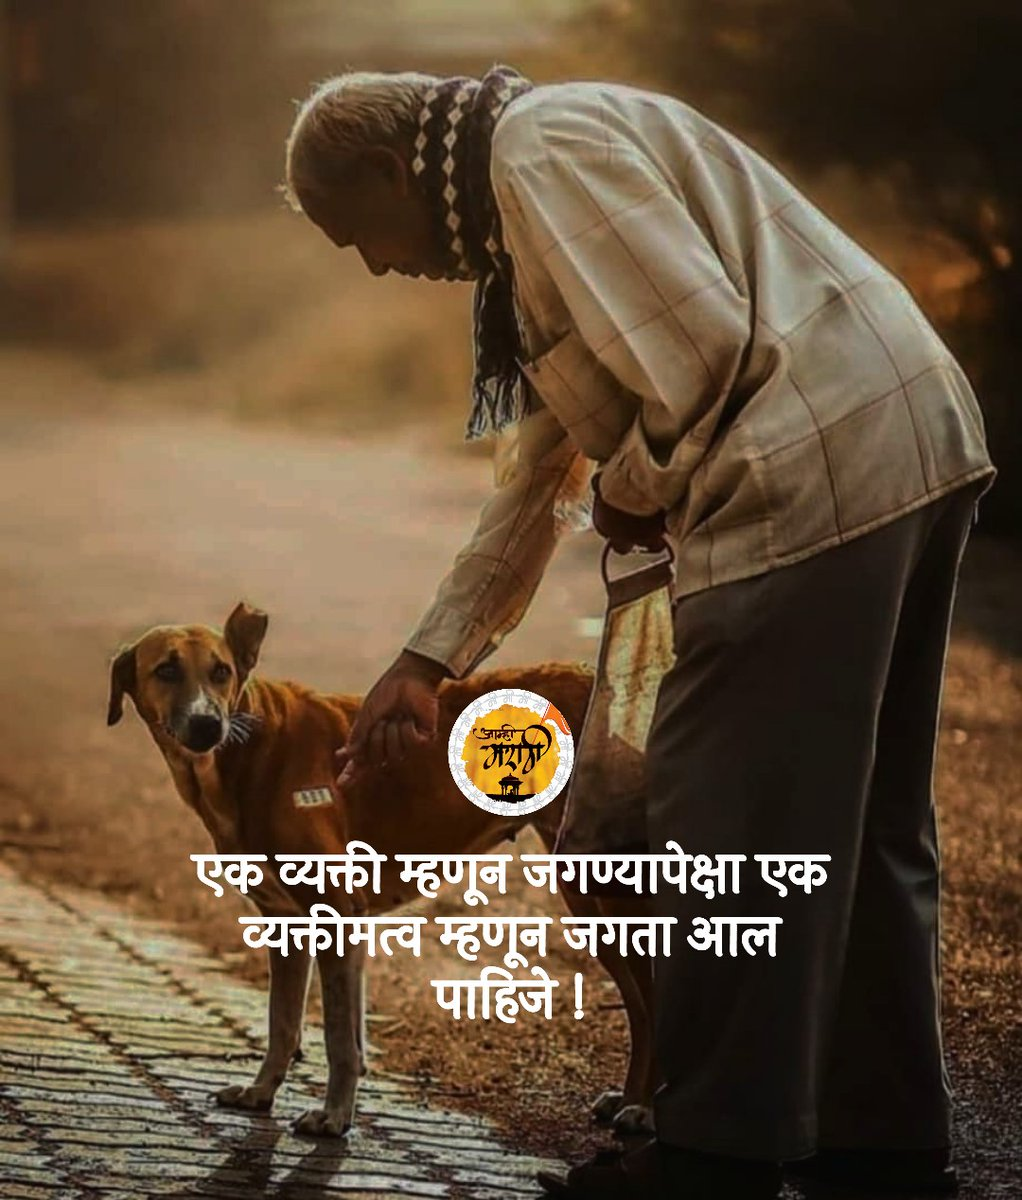 #aamhi_marathi_s #aamhi_marathi #marathistatus #marathi_shoutout #marathiquotes #marathi #marathibride #marathimulgi #marathimulga #marathijokes  #marathiculture #SaturdayMotivation #SaturdayThoughts #SaturdayMorning #abhi_salunke__ #pandurangzolepic.twitter.com/JQXdbPE9qg